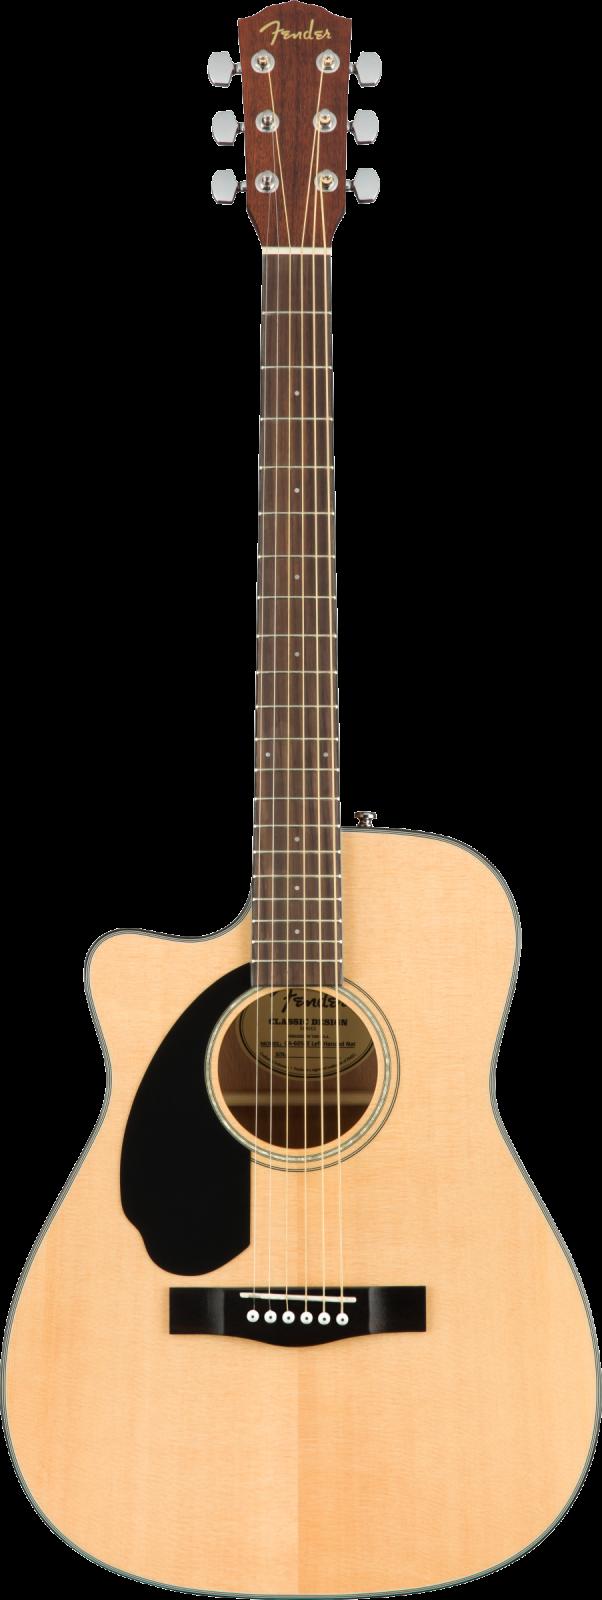 Fender CC-60SCE Concert LH, Walnut Fingerboard, Natural